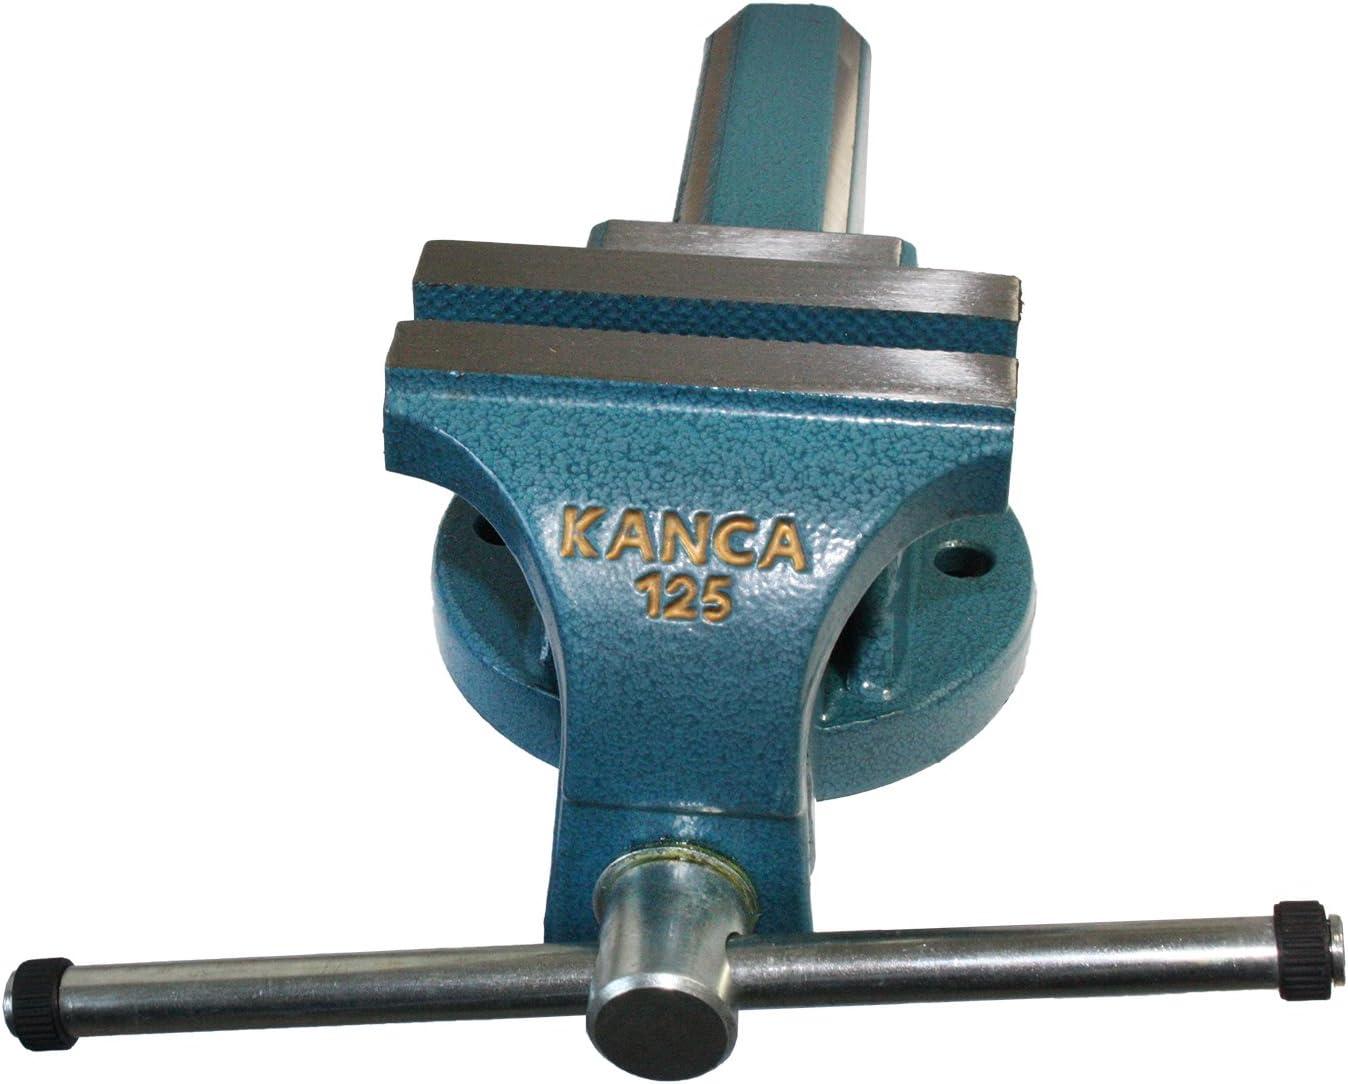 125 mm acero forjado KANCA 60210020125 Tornillo de banco